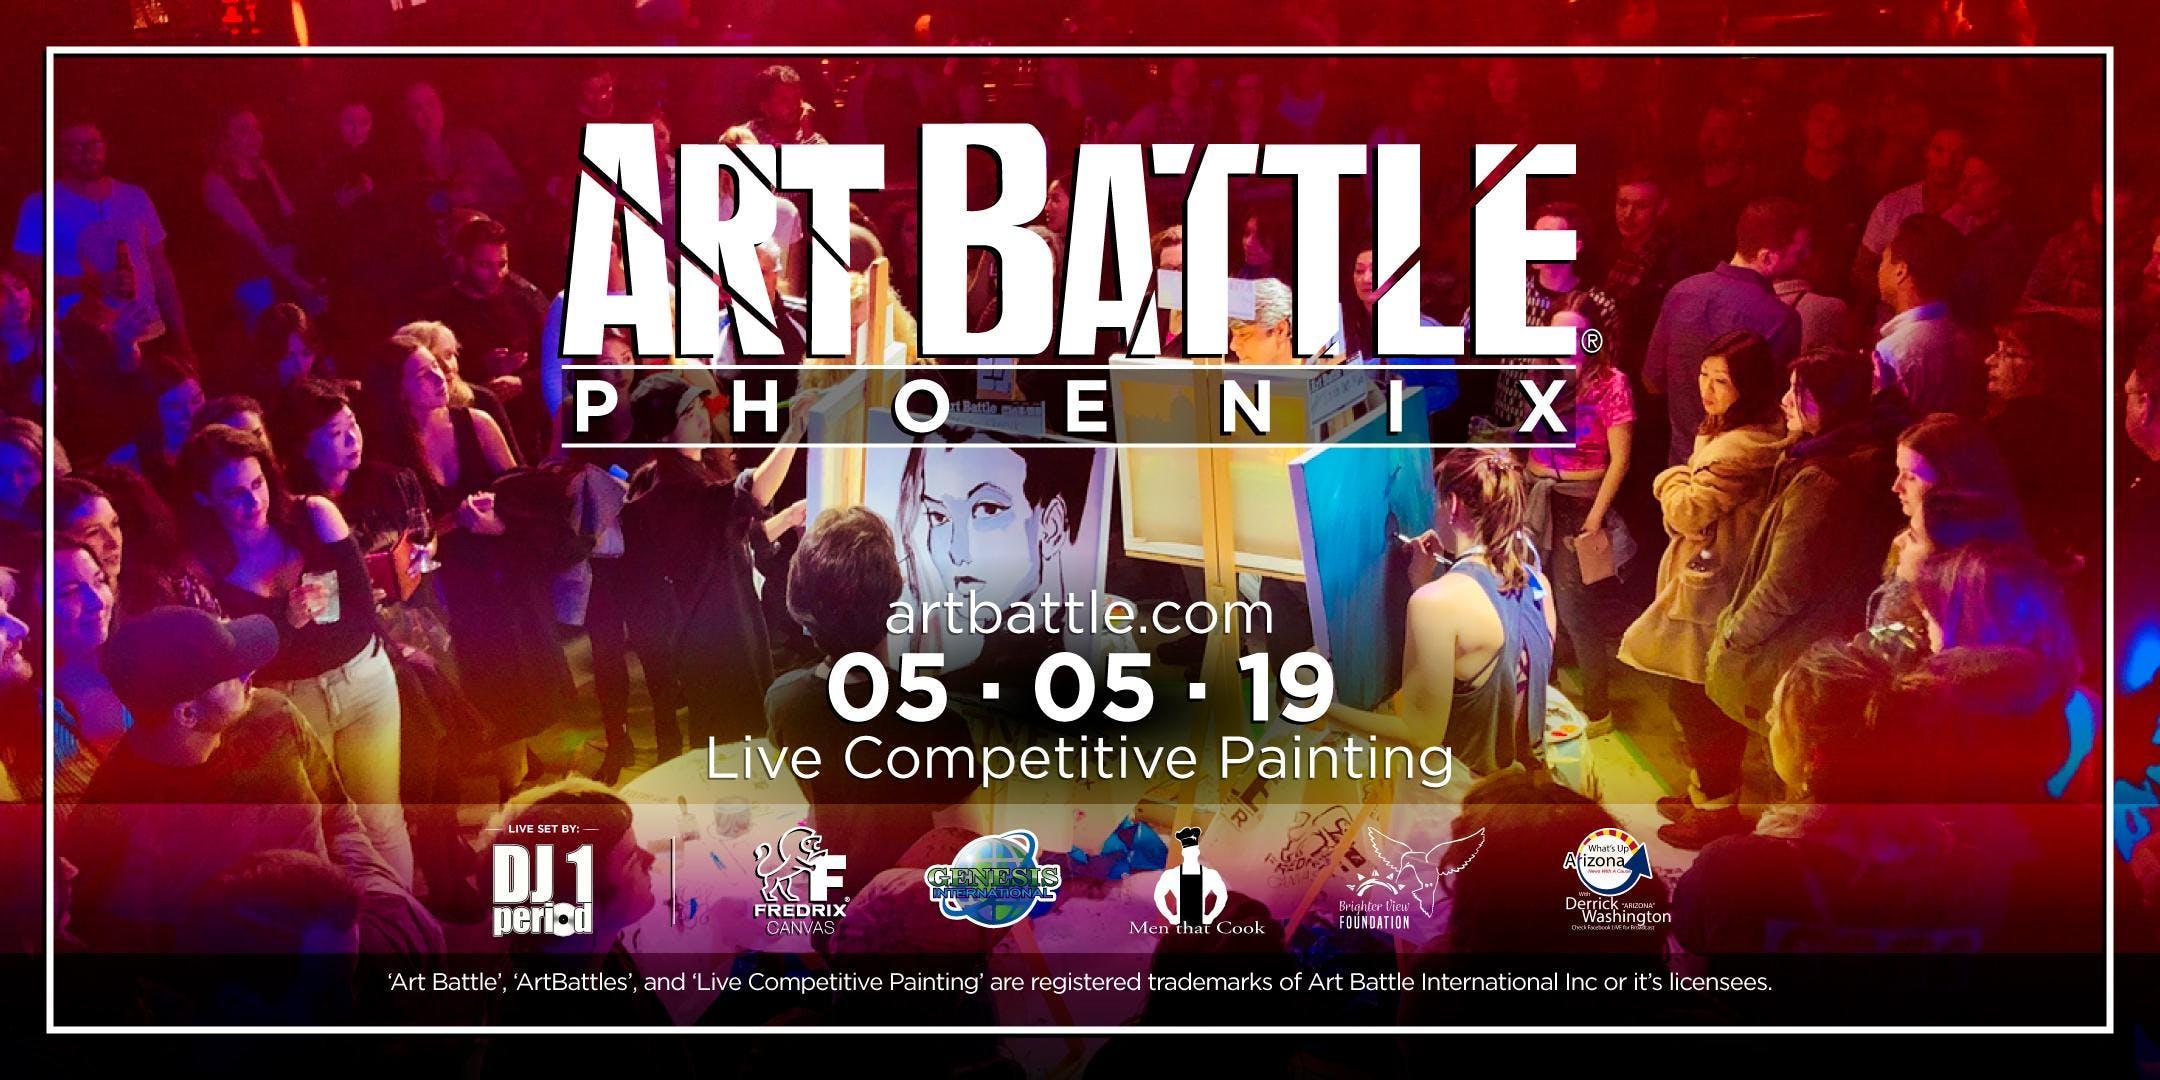 Art Battle Phoenix - May 5, 2019